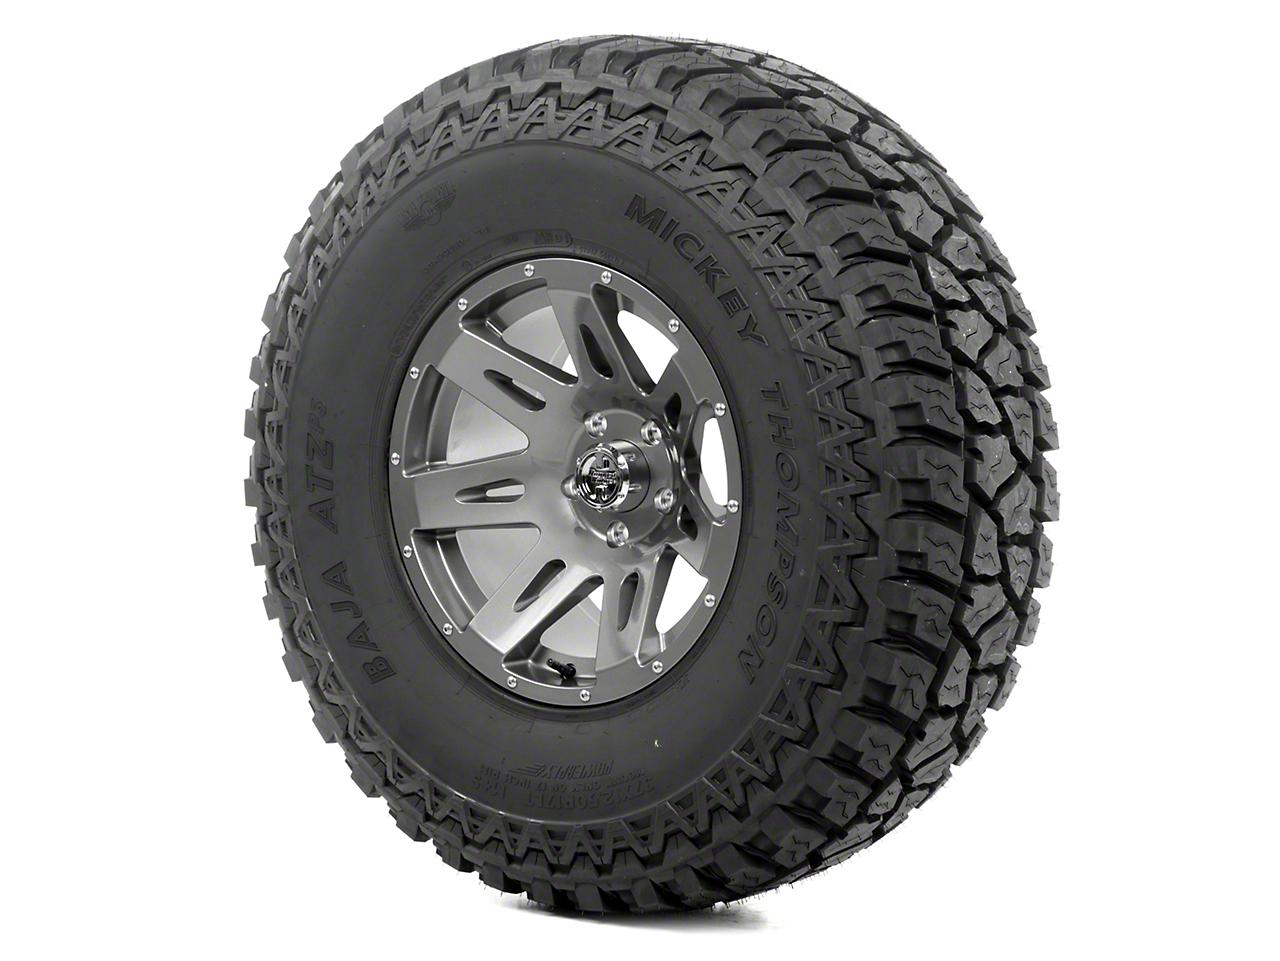 Rugged Ridge XHD Wheel 17x9 Gun Metal and Mickey Thompson ATZ P3 37x12.50x17 Tire Kit (13-18 Jeep Wrangler JK; 2018 Jeep Wrangler JL)